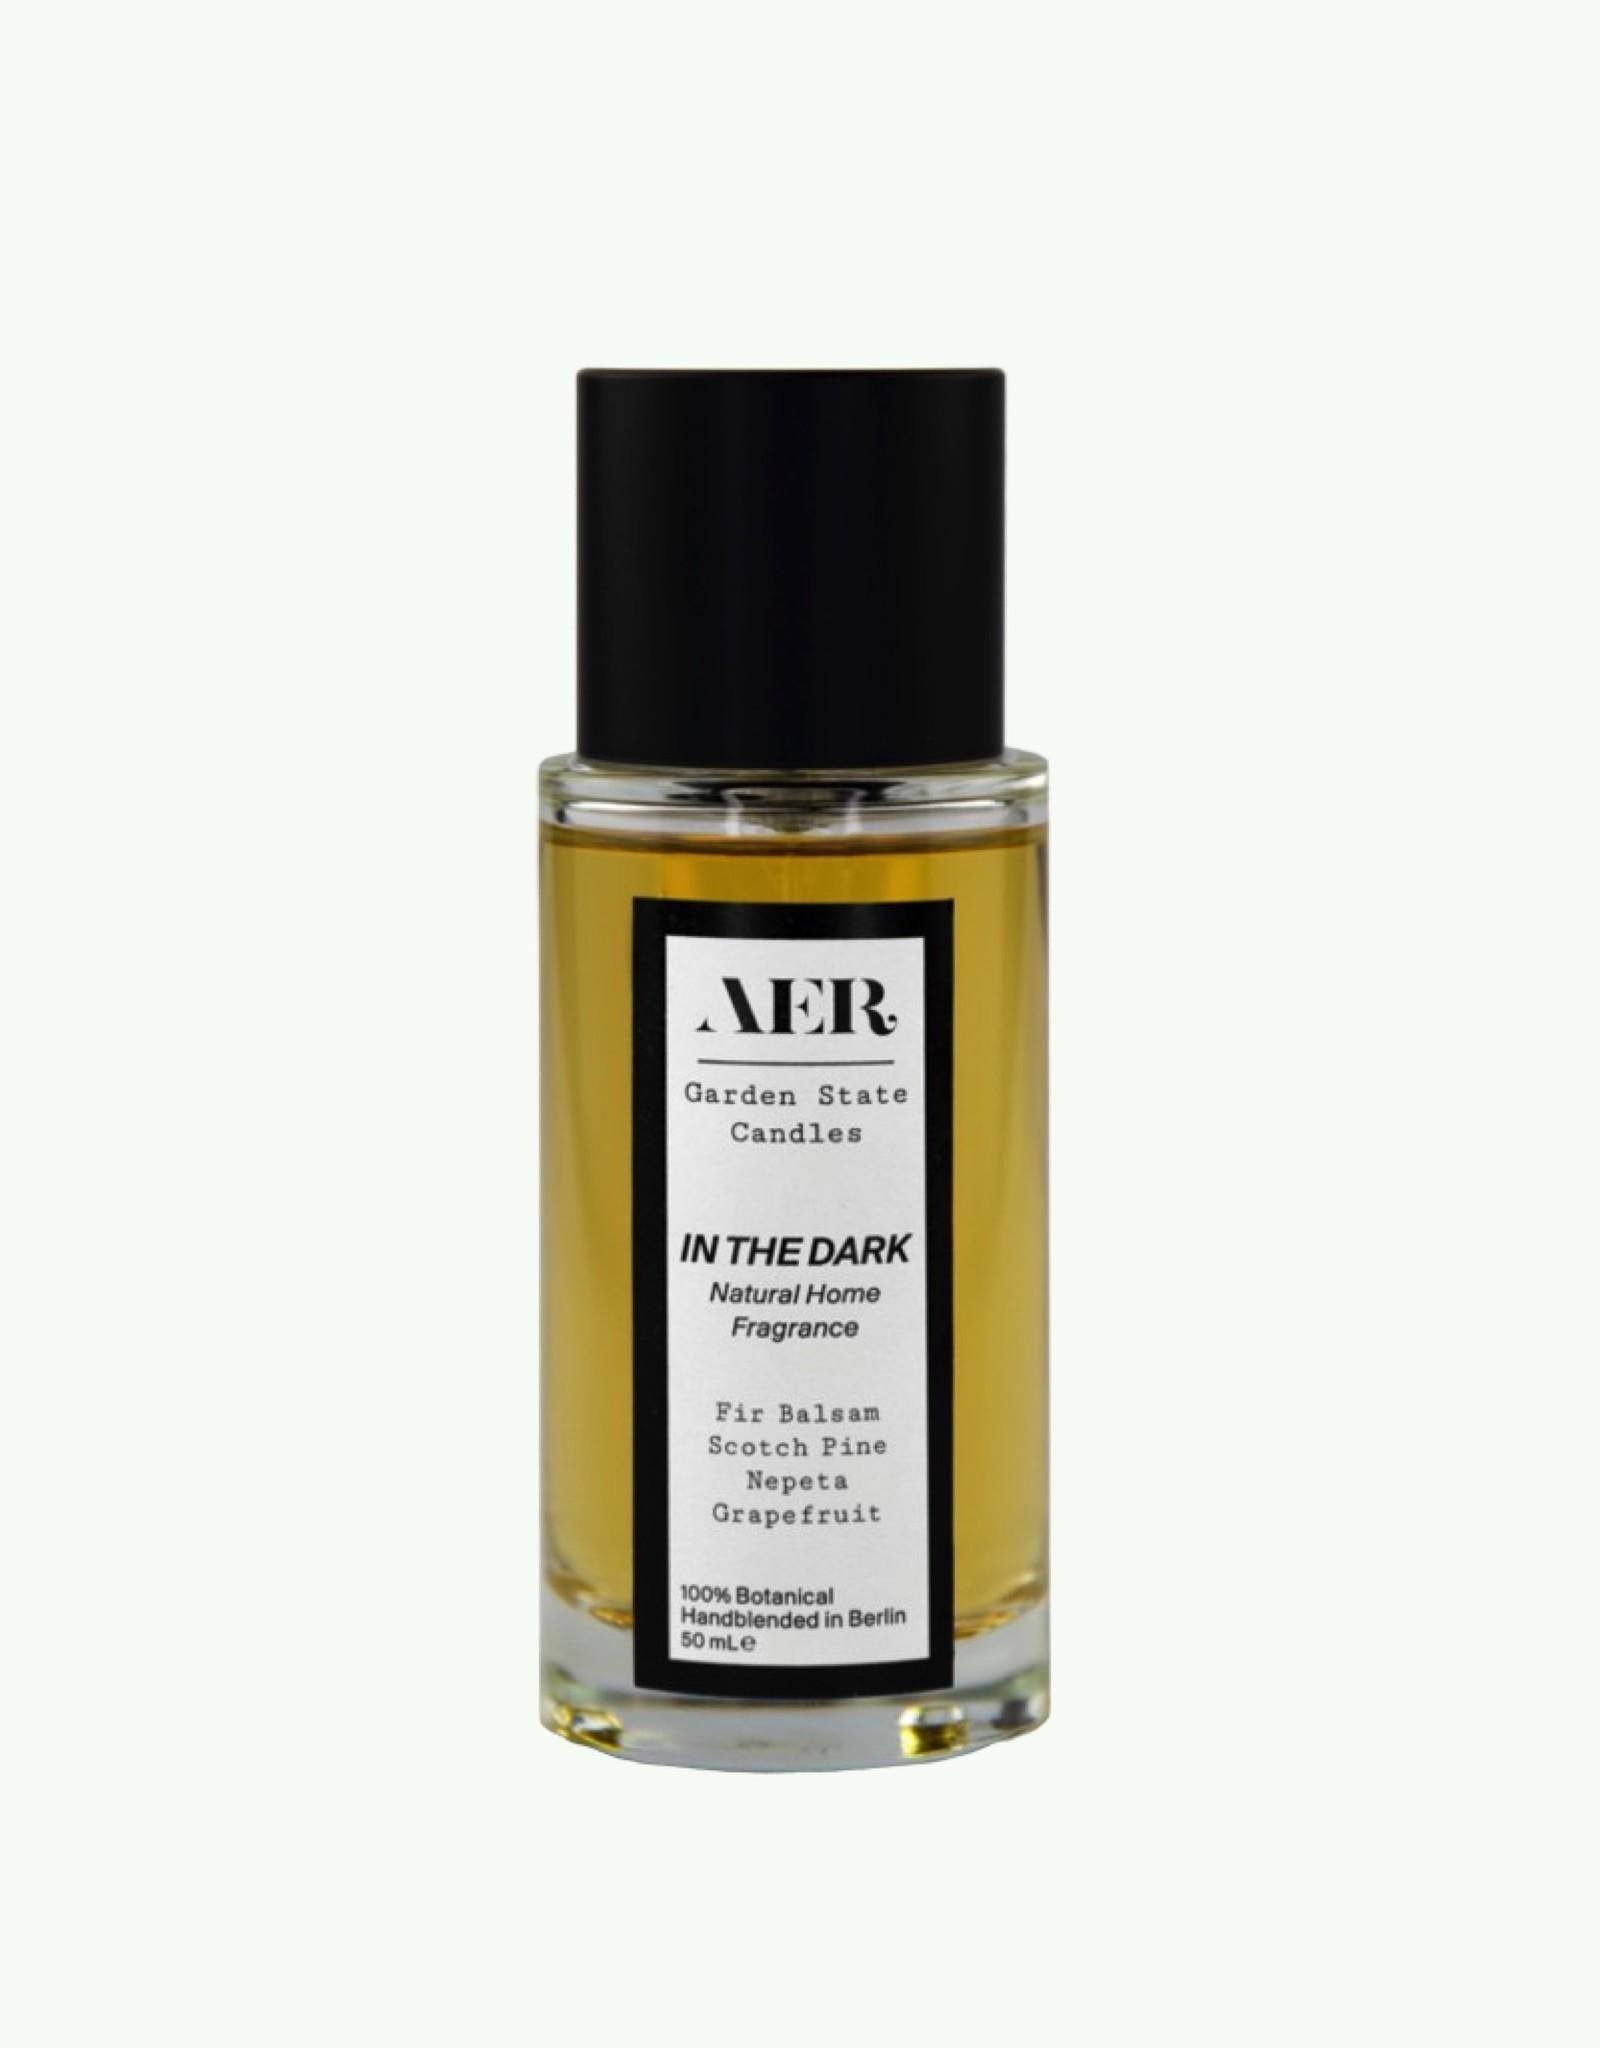 Aer AER - IN THE DARK - Homespray